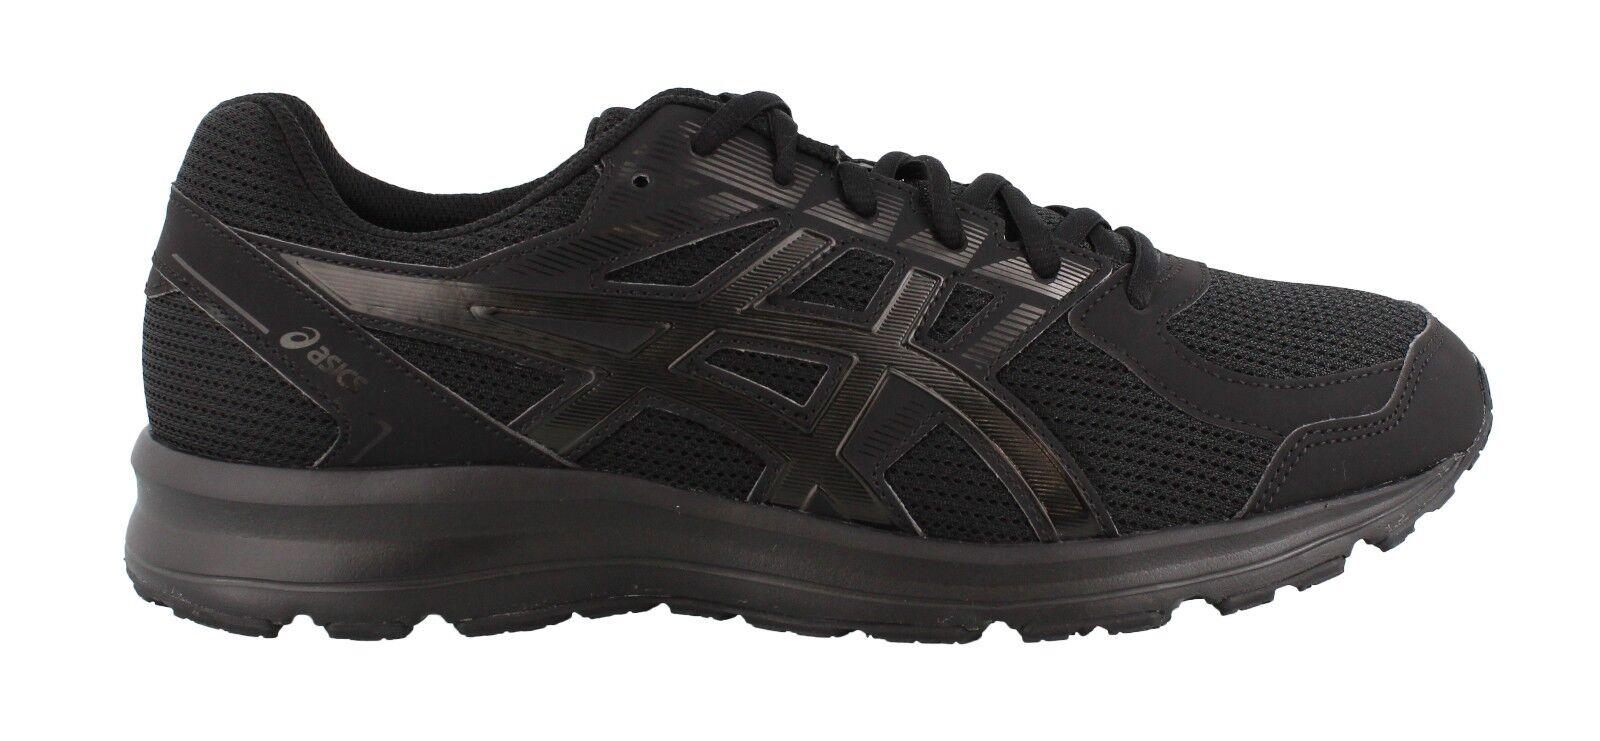 Asics Men's WIDE'S T7K3N/9099 Sneaker Black Shoes Size 9 Sample